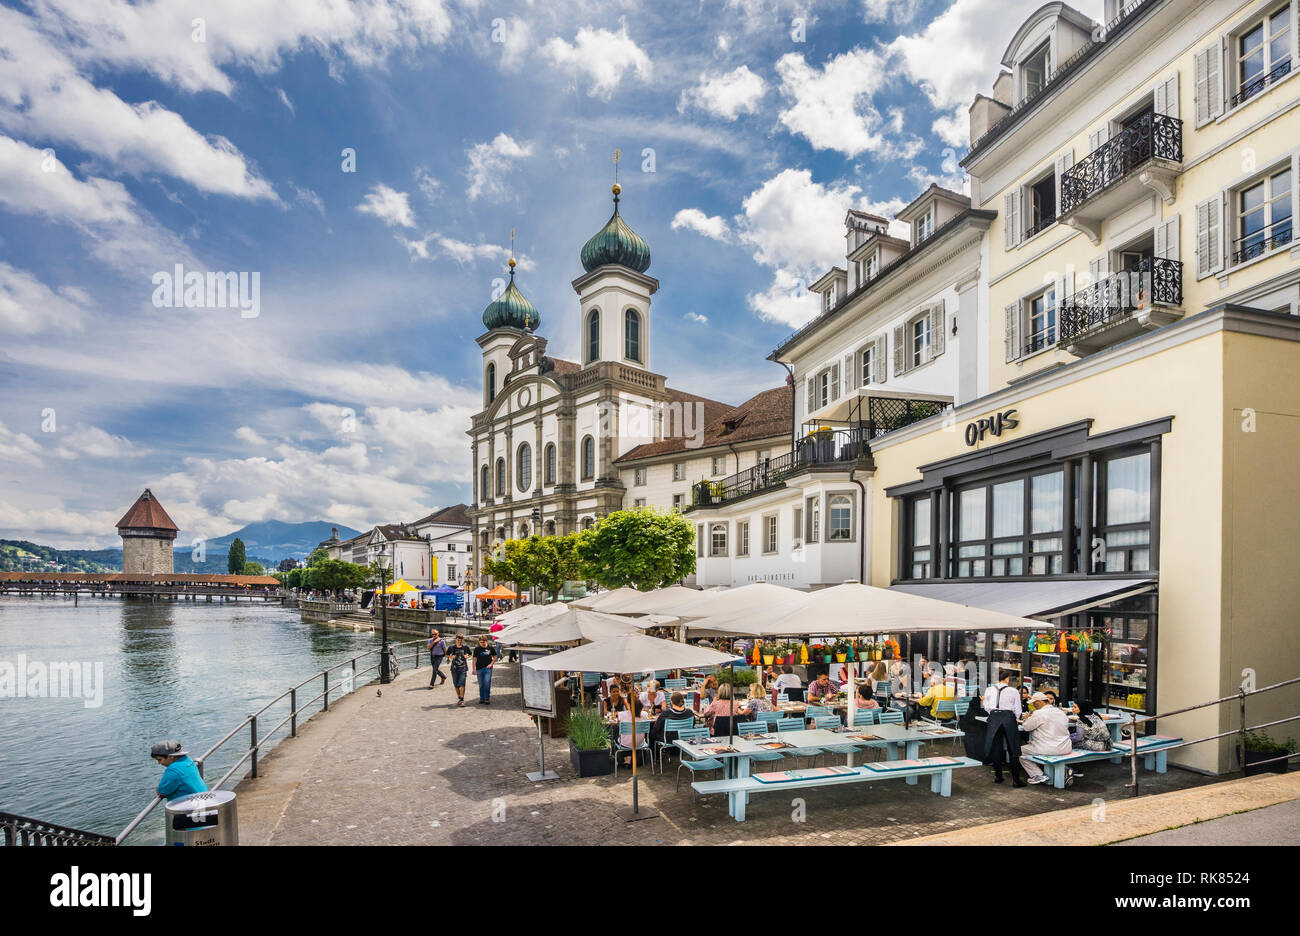 Restaurants at Reusssteg on the banks of the Reuss river with view Lucerne Jesuit Church, Lucerne, Canton Lucerne, Switzerland - Stock Image